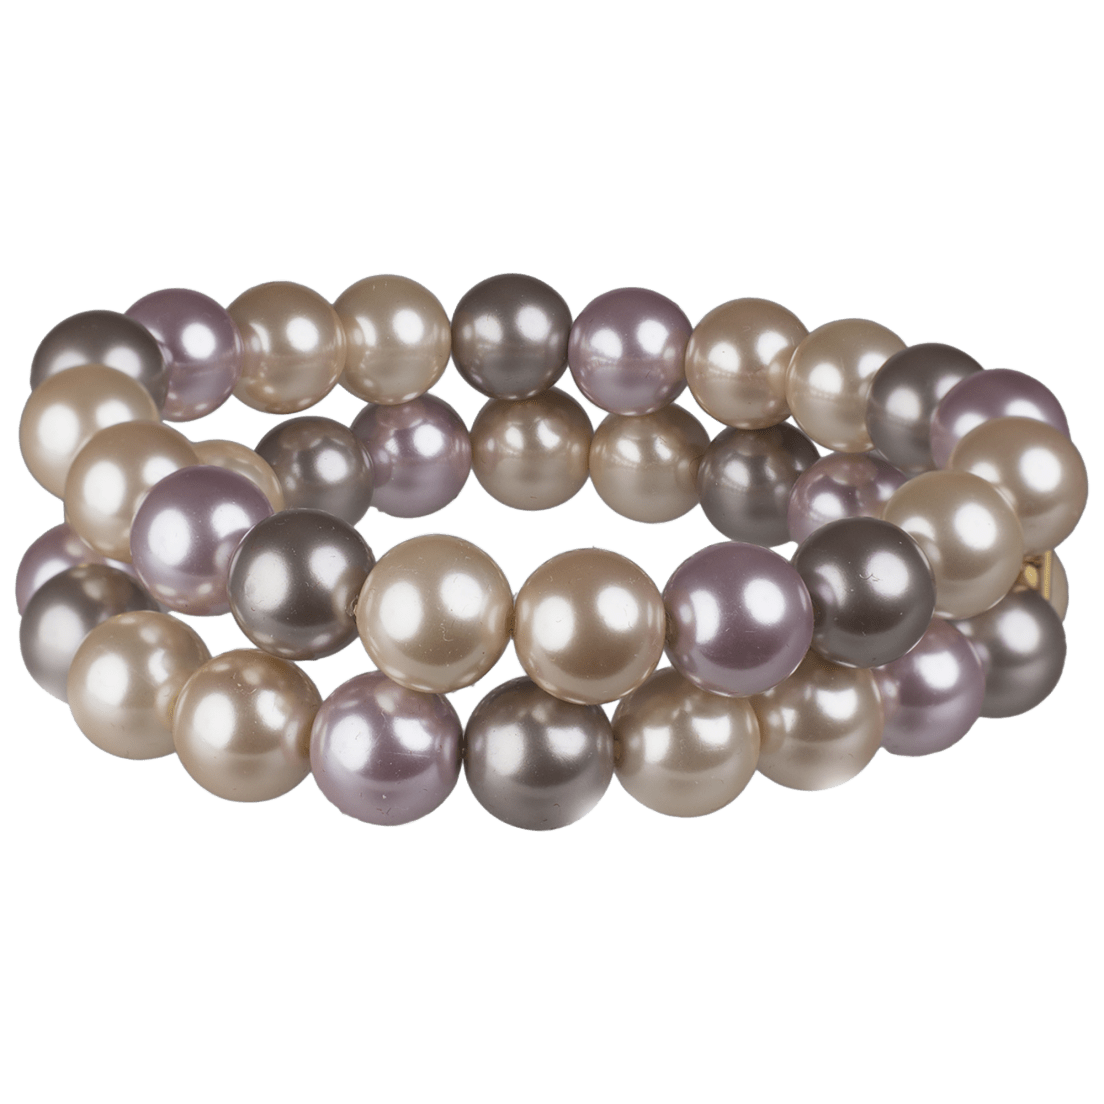 e9f59cec6c996 Kenneth Jay Lane Two Strand Faux Pearl Bracelets